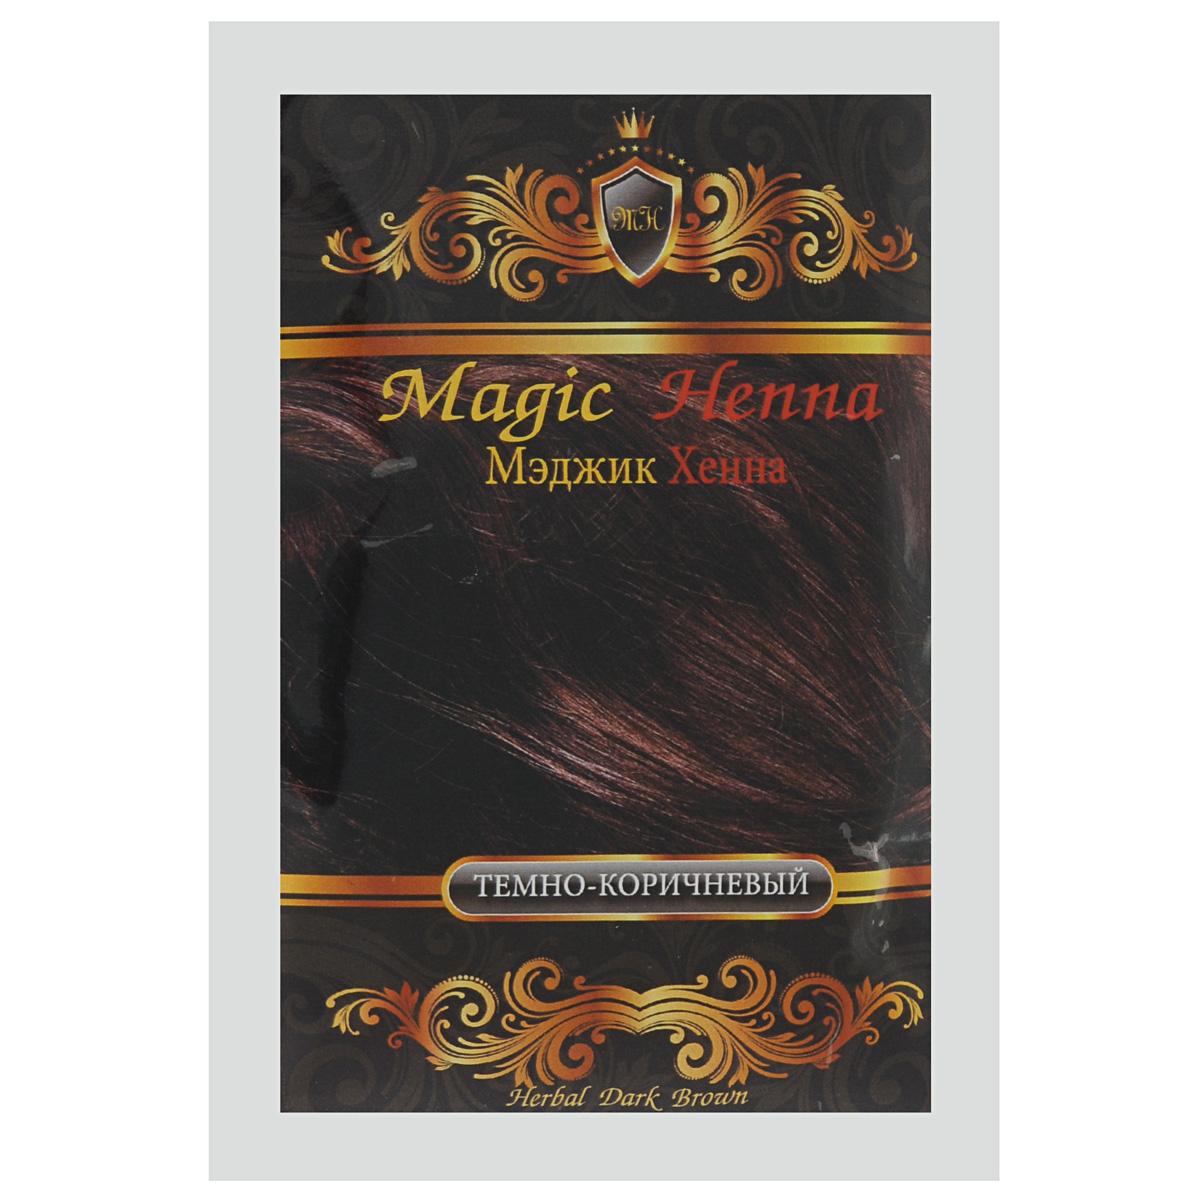 Magic Henna Лечебная травяная краска для волос с хной, темно-коричневый (Dark Brown), 100 г7147Лечебная травяная краска с хной Magic Henna - Темно-коричневый (Dark Brown)